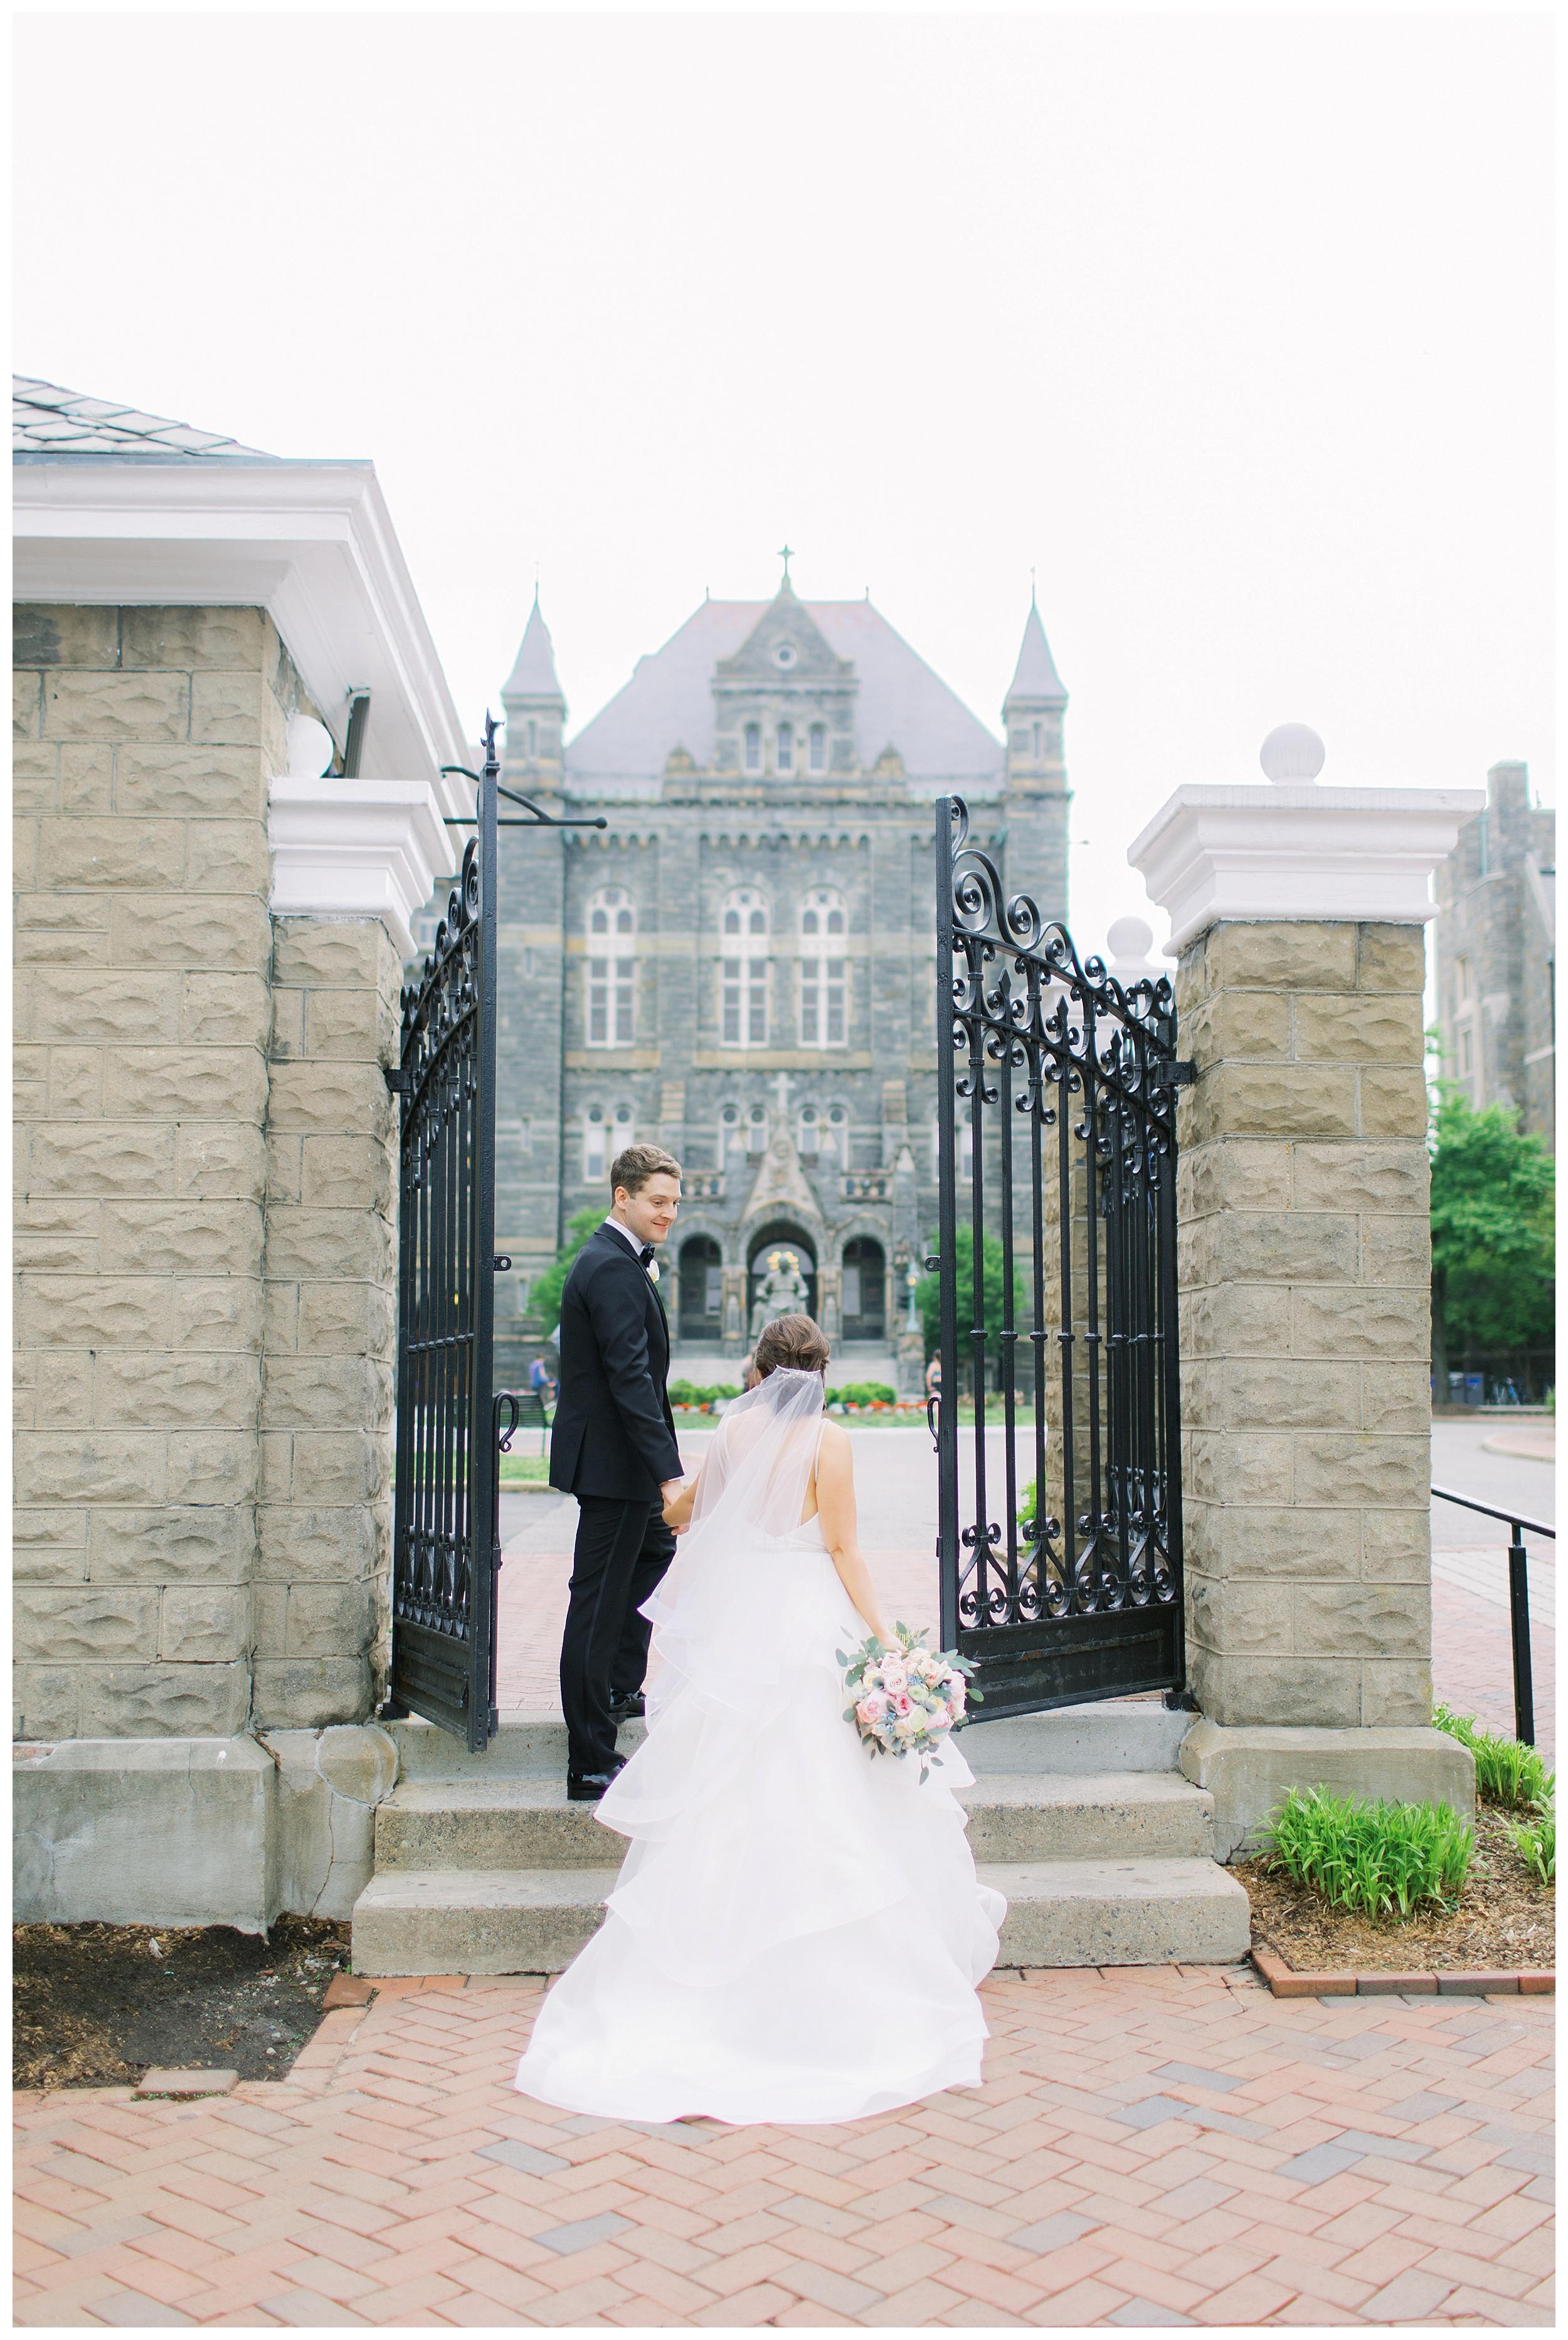 DAR Constitution Hall Wedding Wedding | Daughters of the American Revolution Wedding | District of Columbia Film Wedding Photographer Kir Tuben_0003.jpg